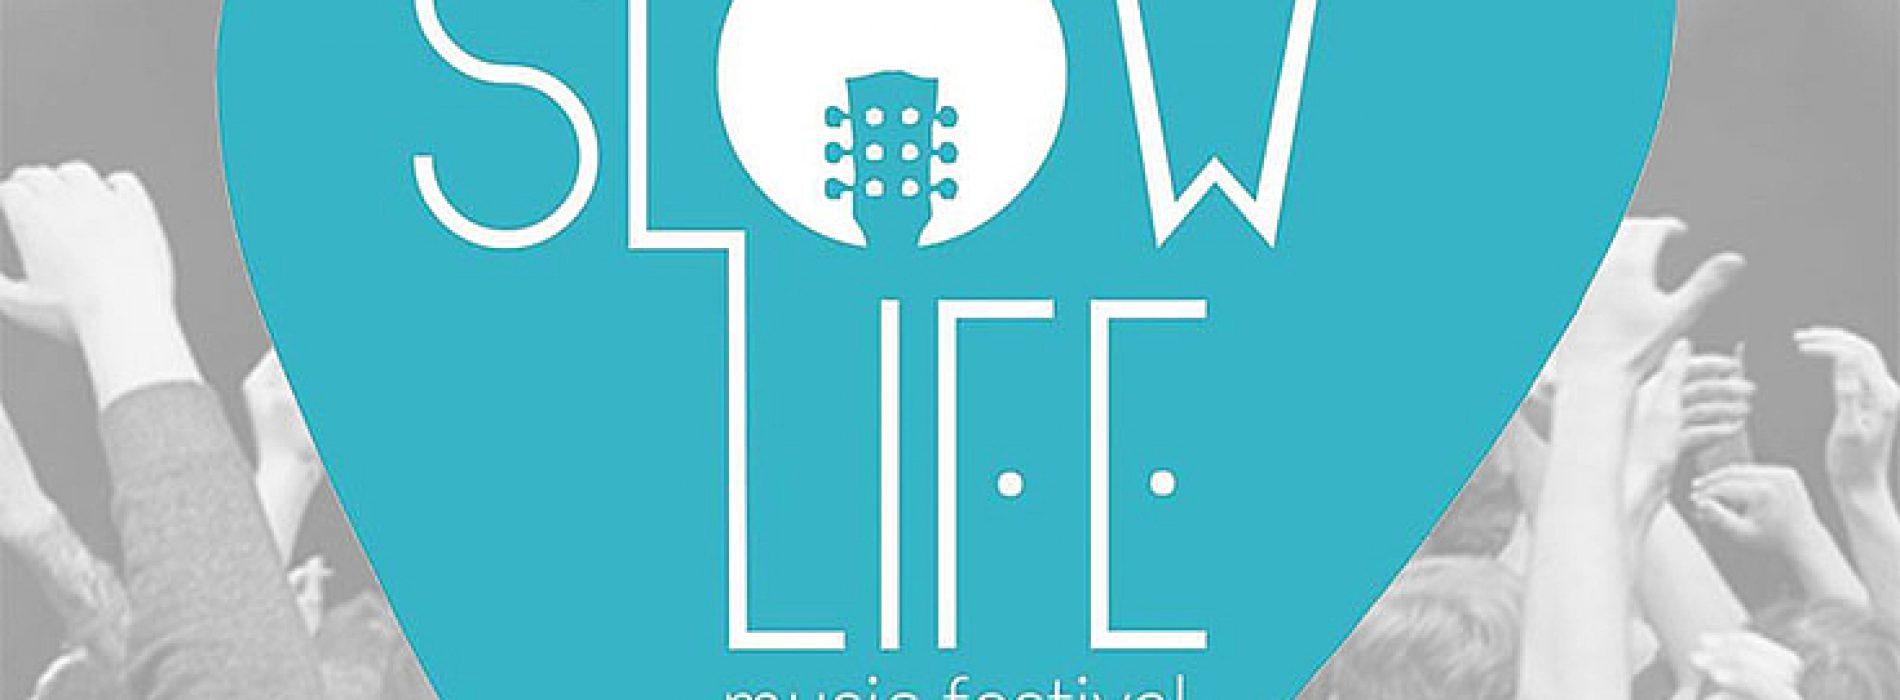 9 lipca rusza Slow Life Music Festival